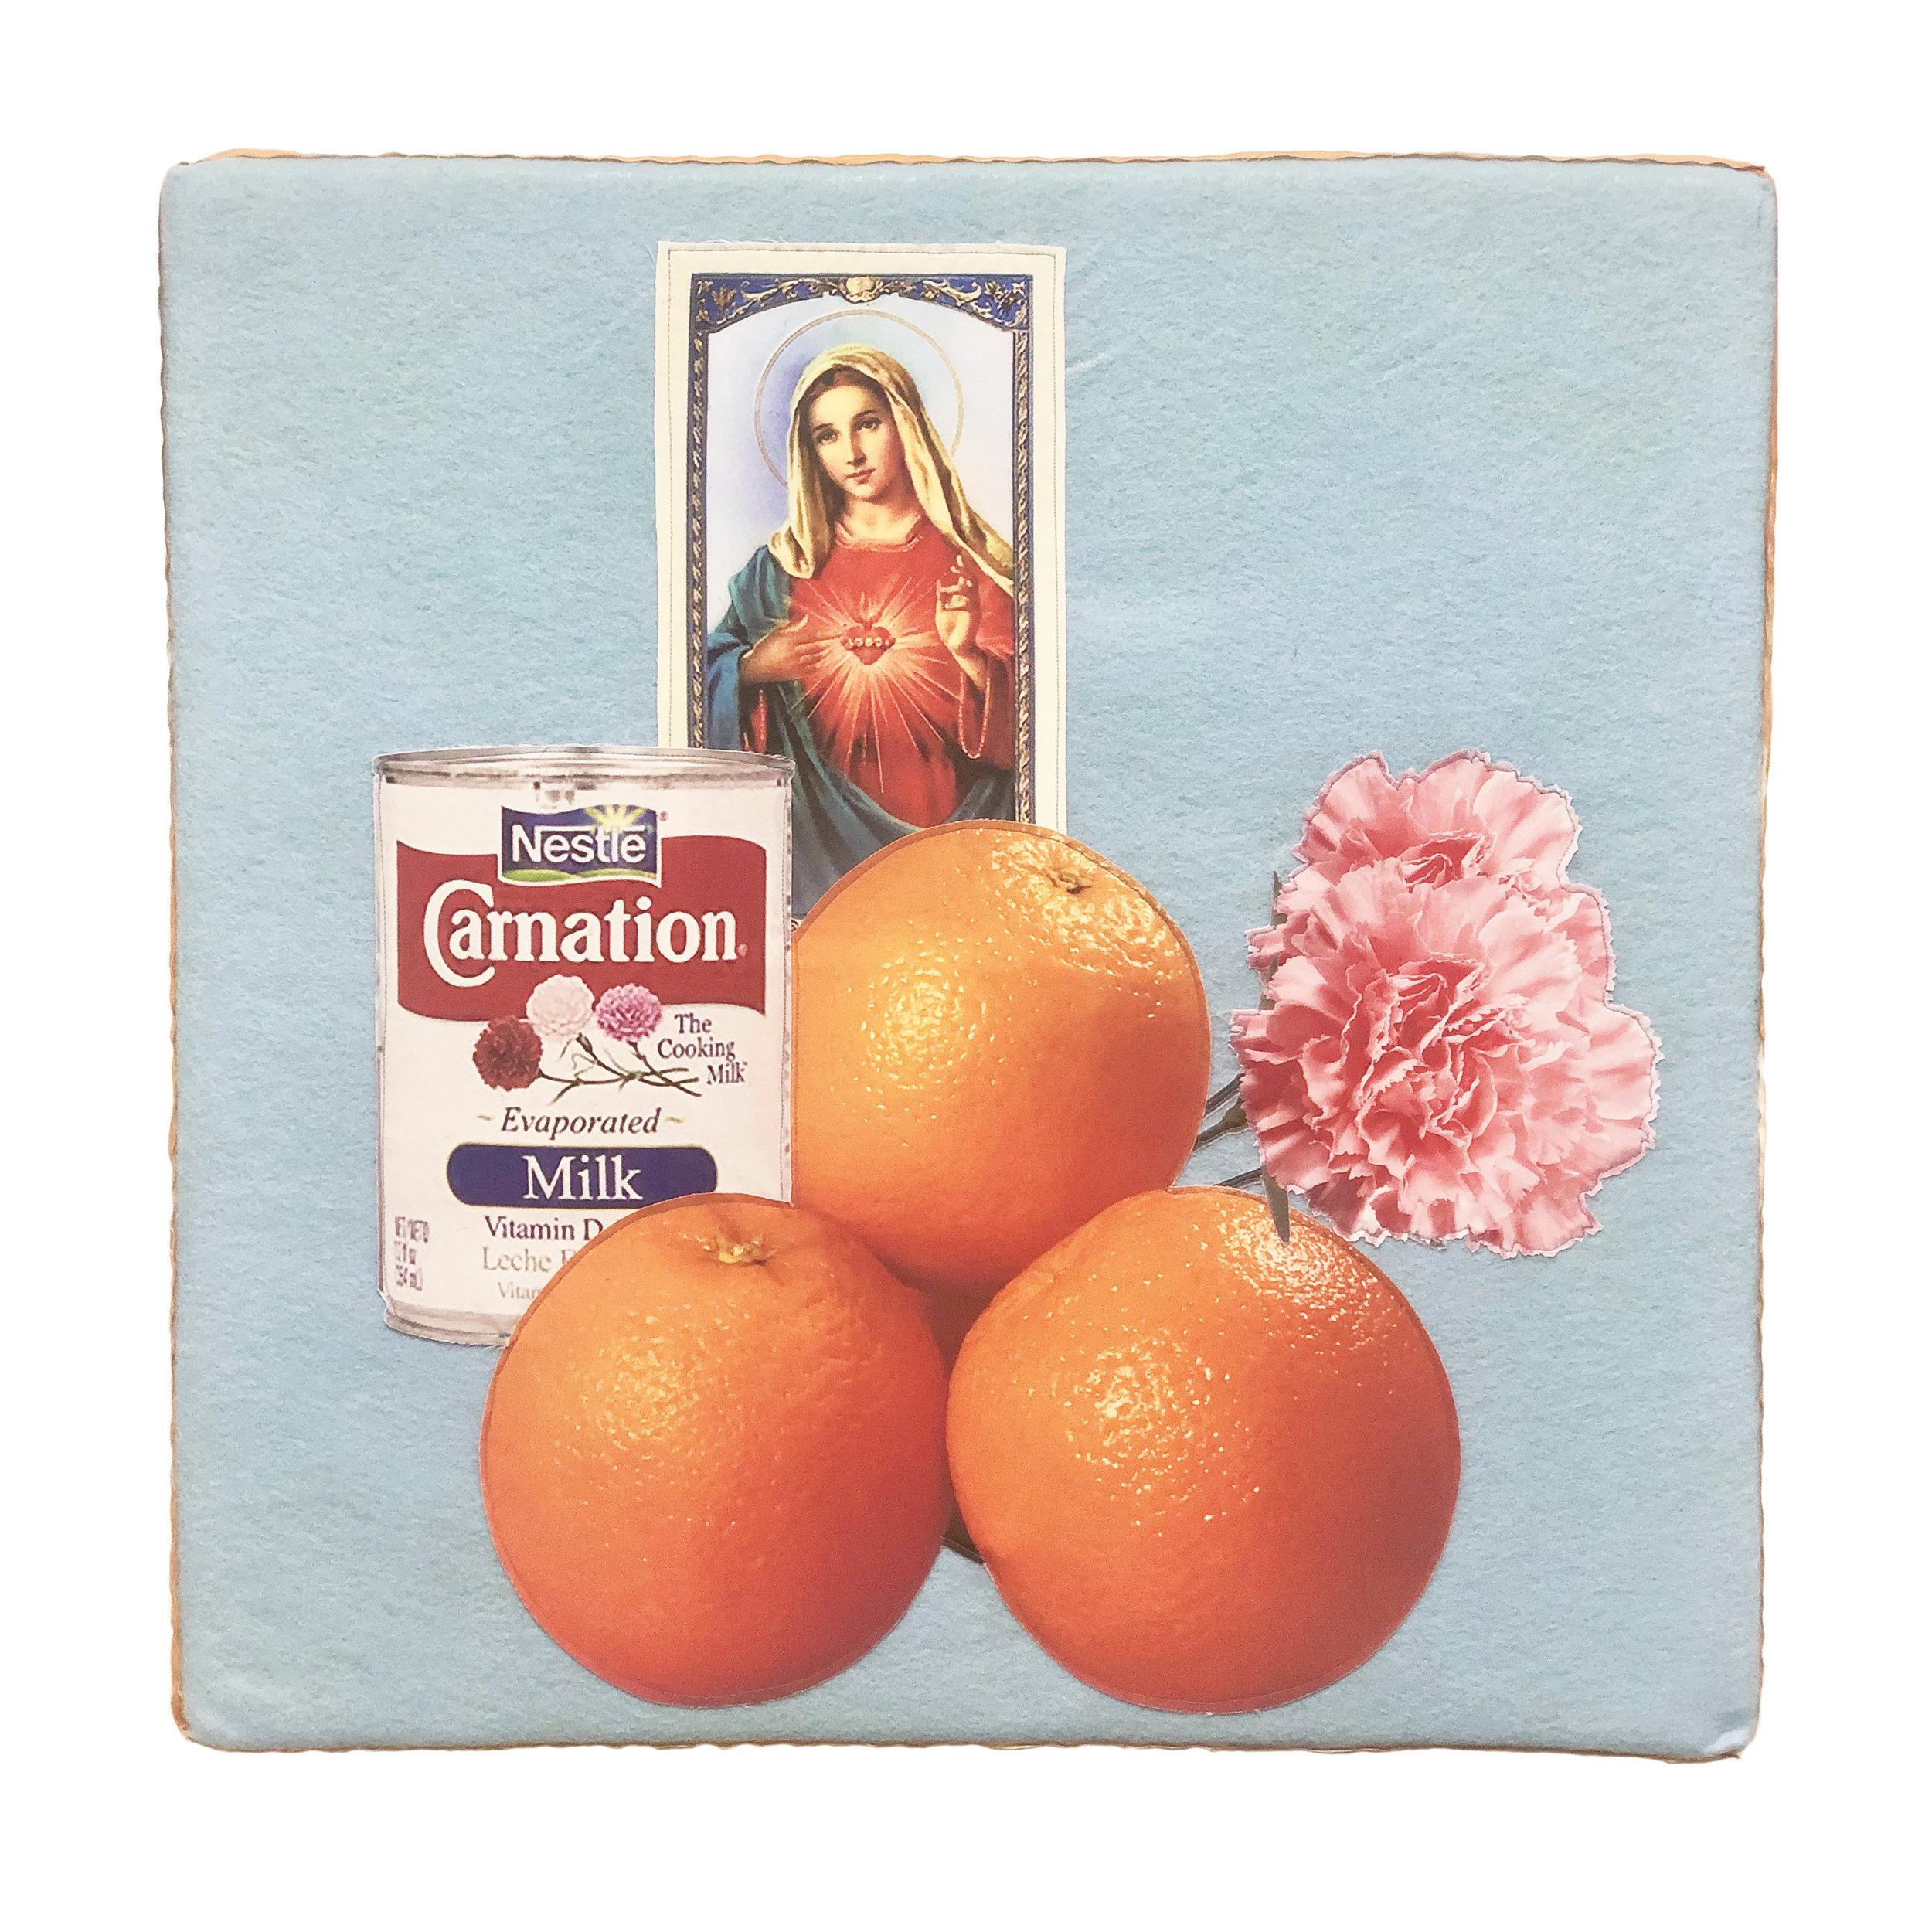 For Tia, Morir Soñando   Digital Print on Brush Suede, Cotton, Felt on foam 22 x 22 x 2 in SOLD